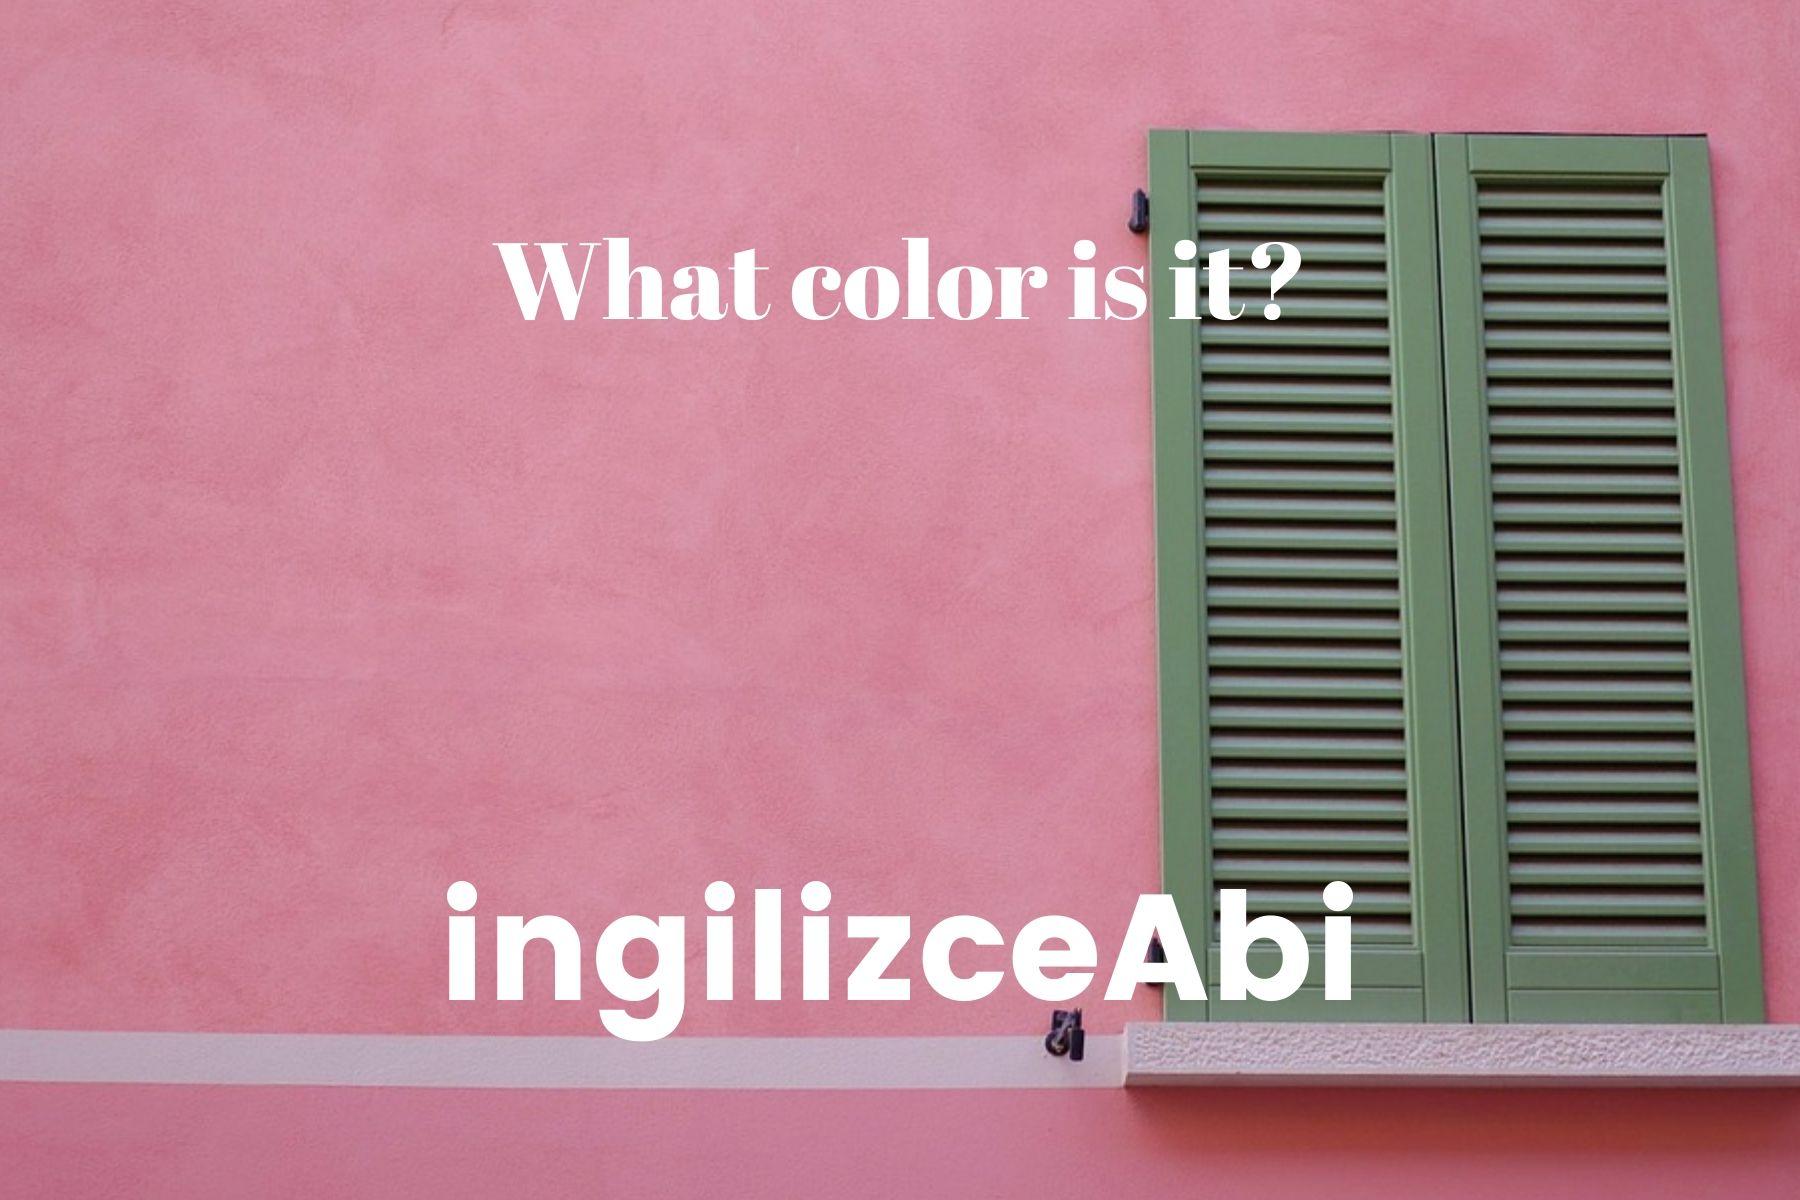 Pink Color - ingilizce renkler - ingilizceabi